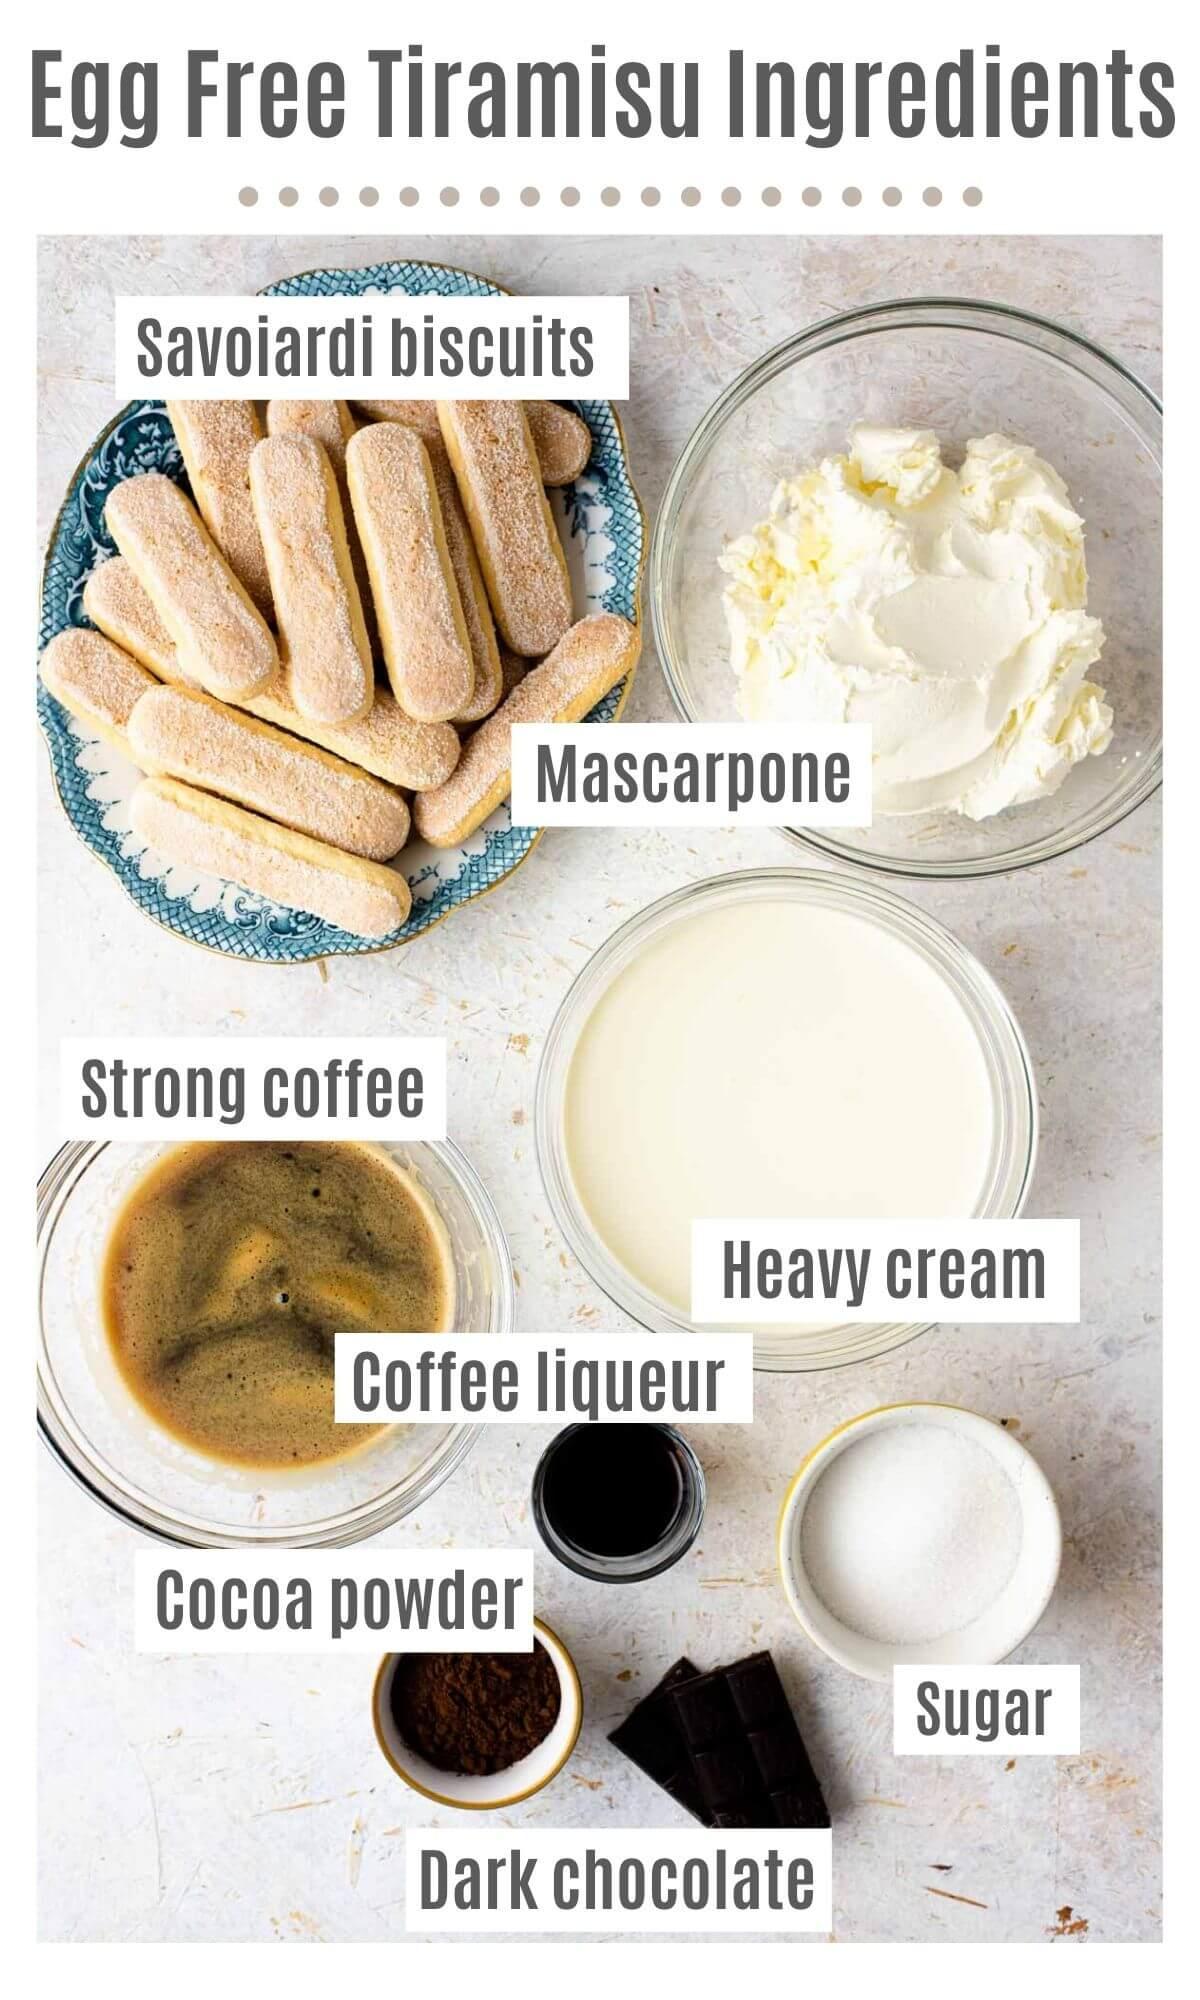 An overhead shot of all the ingredients you need to make egg free tiramisu